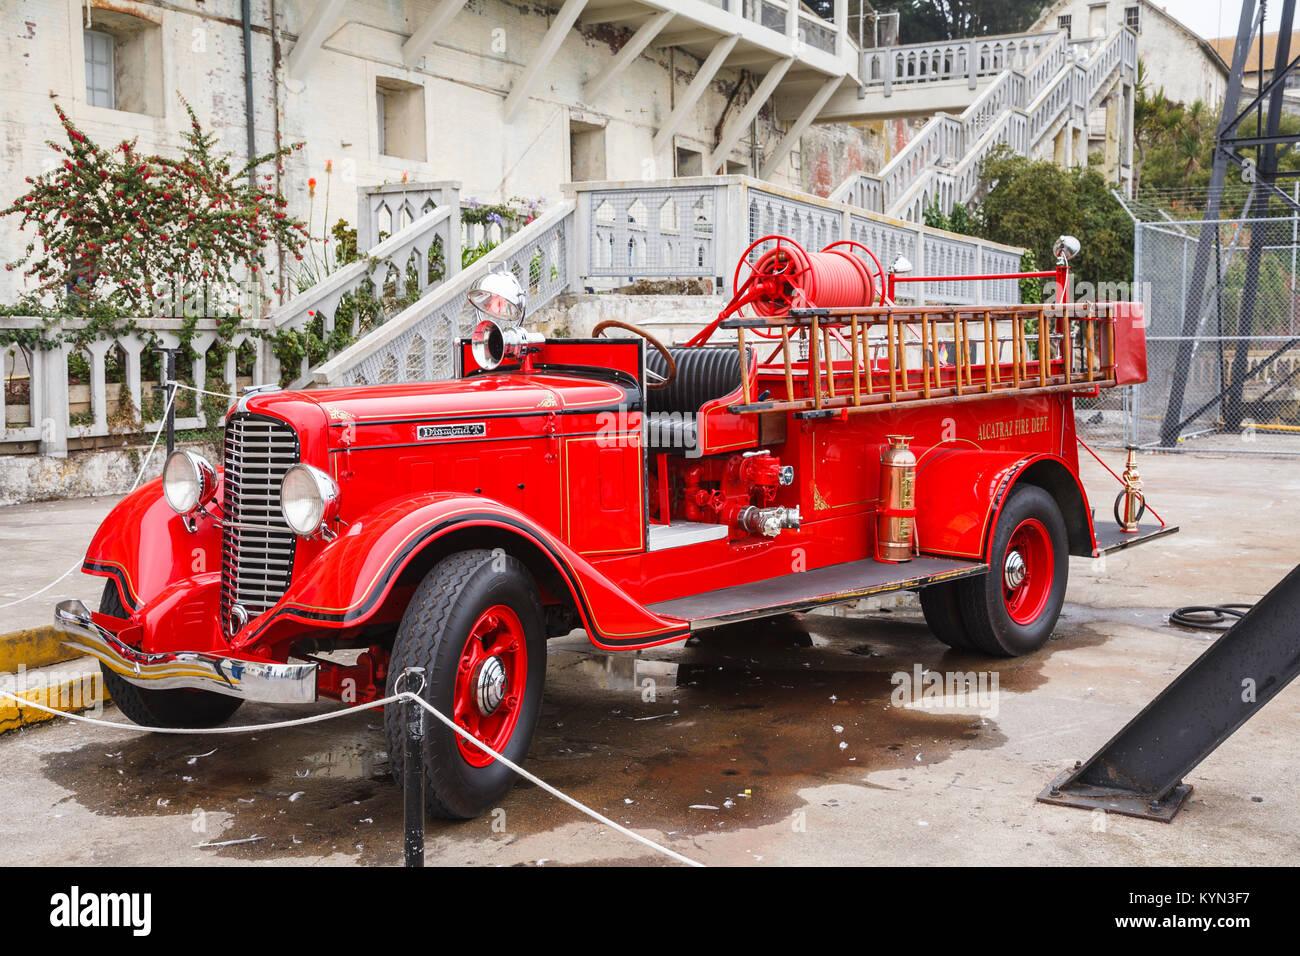 Vintage red Alcatraz Fire Dept fire engine on display at Alcatraz Federal Penitentiary, Alcatraz Island, San Francisco, - Stock Image